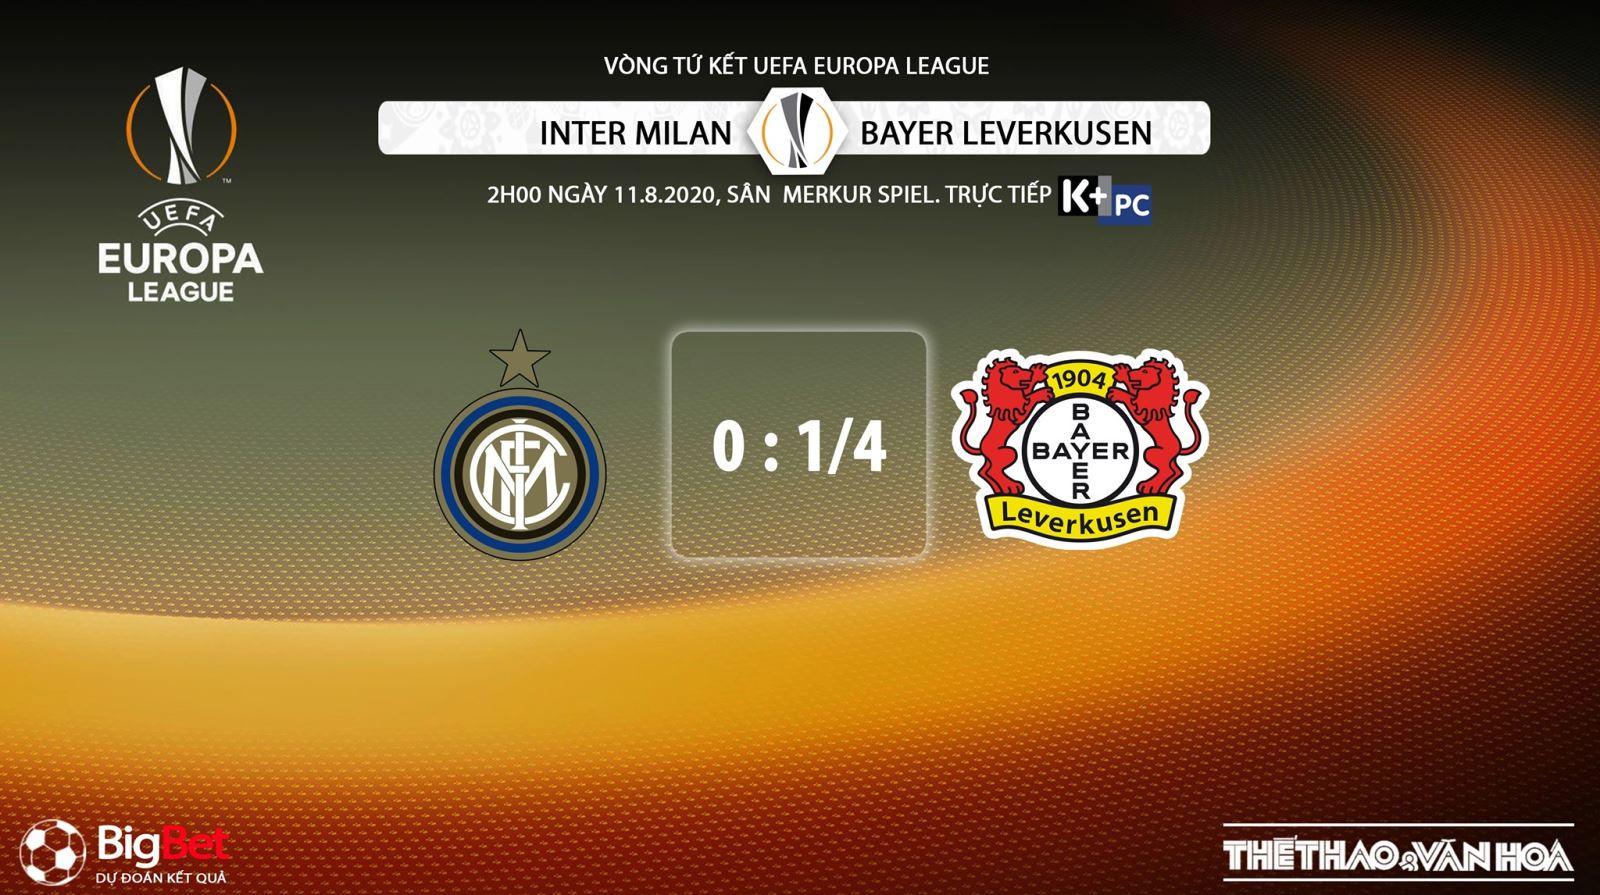 soi kèo Inter Milan vs Leverkusen, Inter Milan, Leverkusen, trực tiếp bóng đá, soi kèo bóng đá, kèo bóng đá, kèo Inter Milan vs Leverkusen